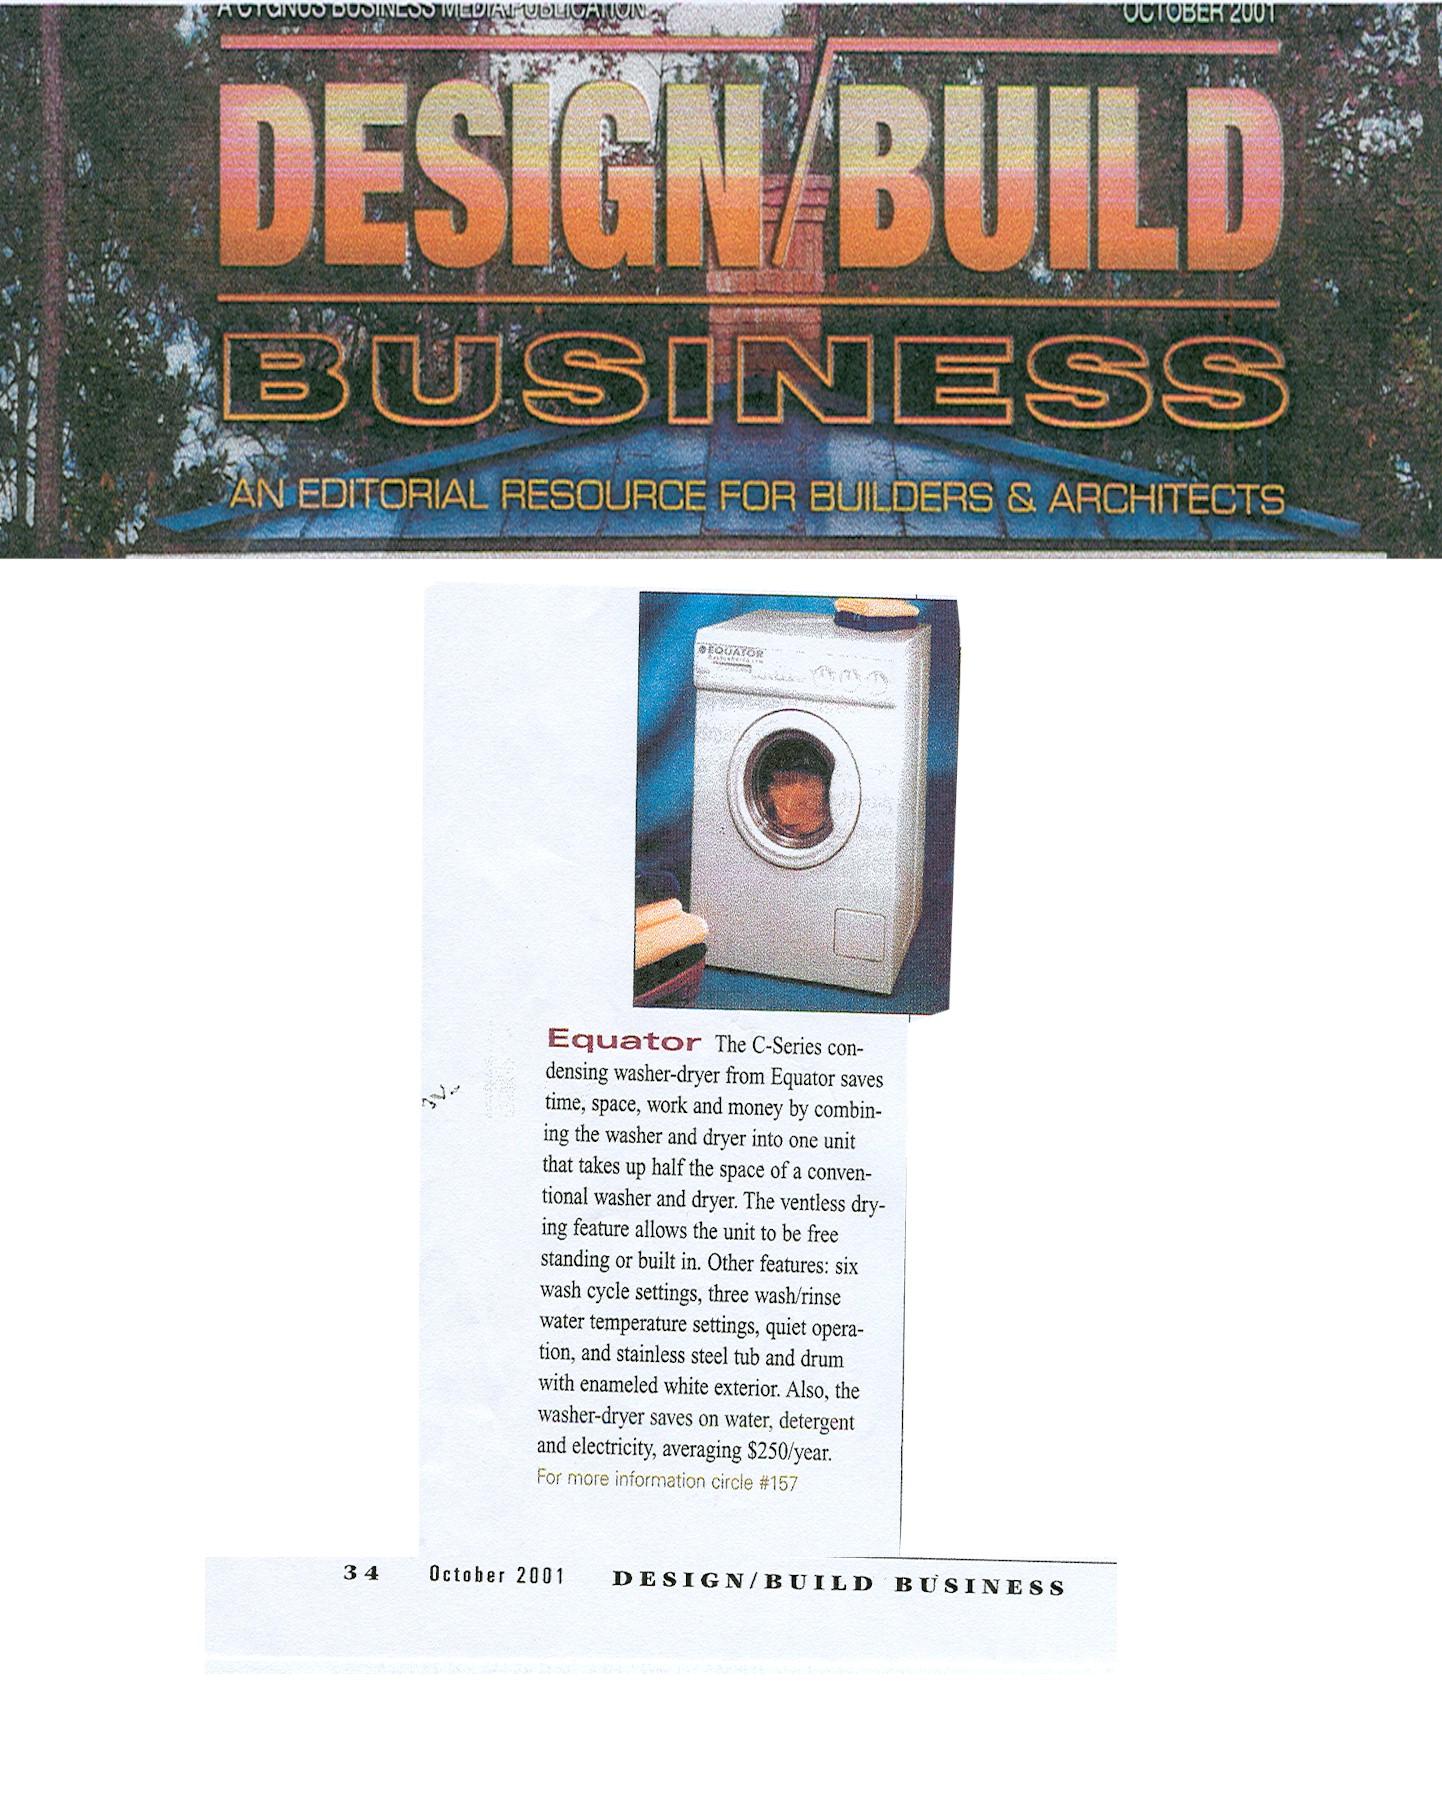 Design Build Business